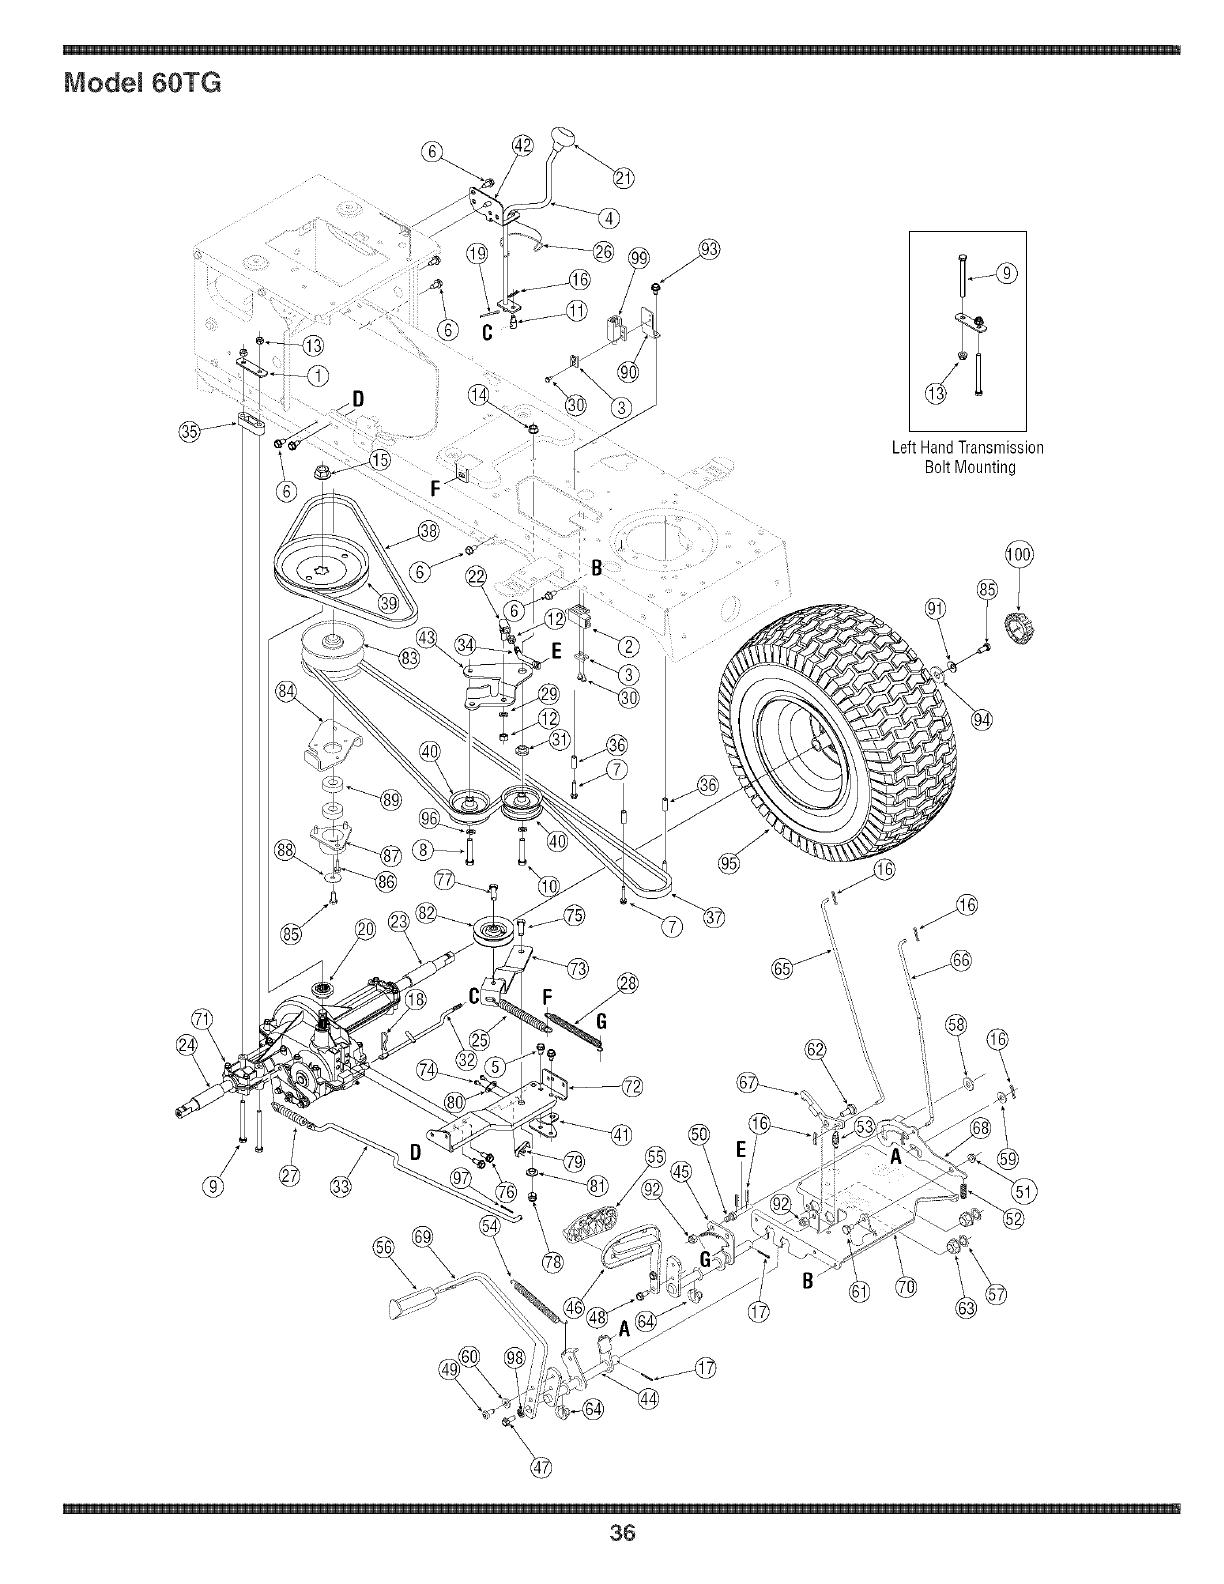 Troy Bilt 60tg Wiring Diagram Mitsubishi Diagrams Delta Weed Eater Simplicity Tg On